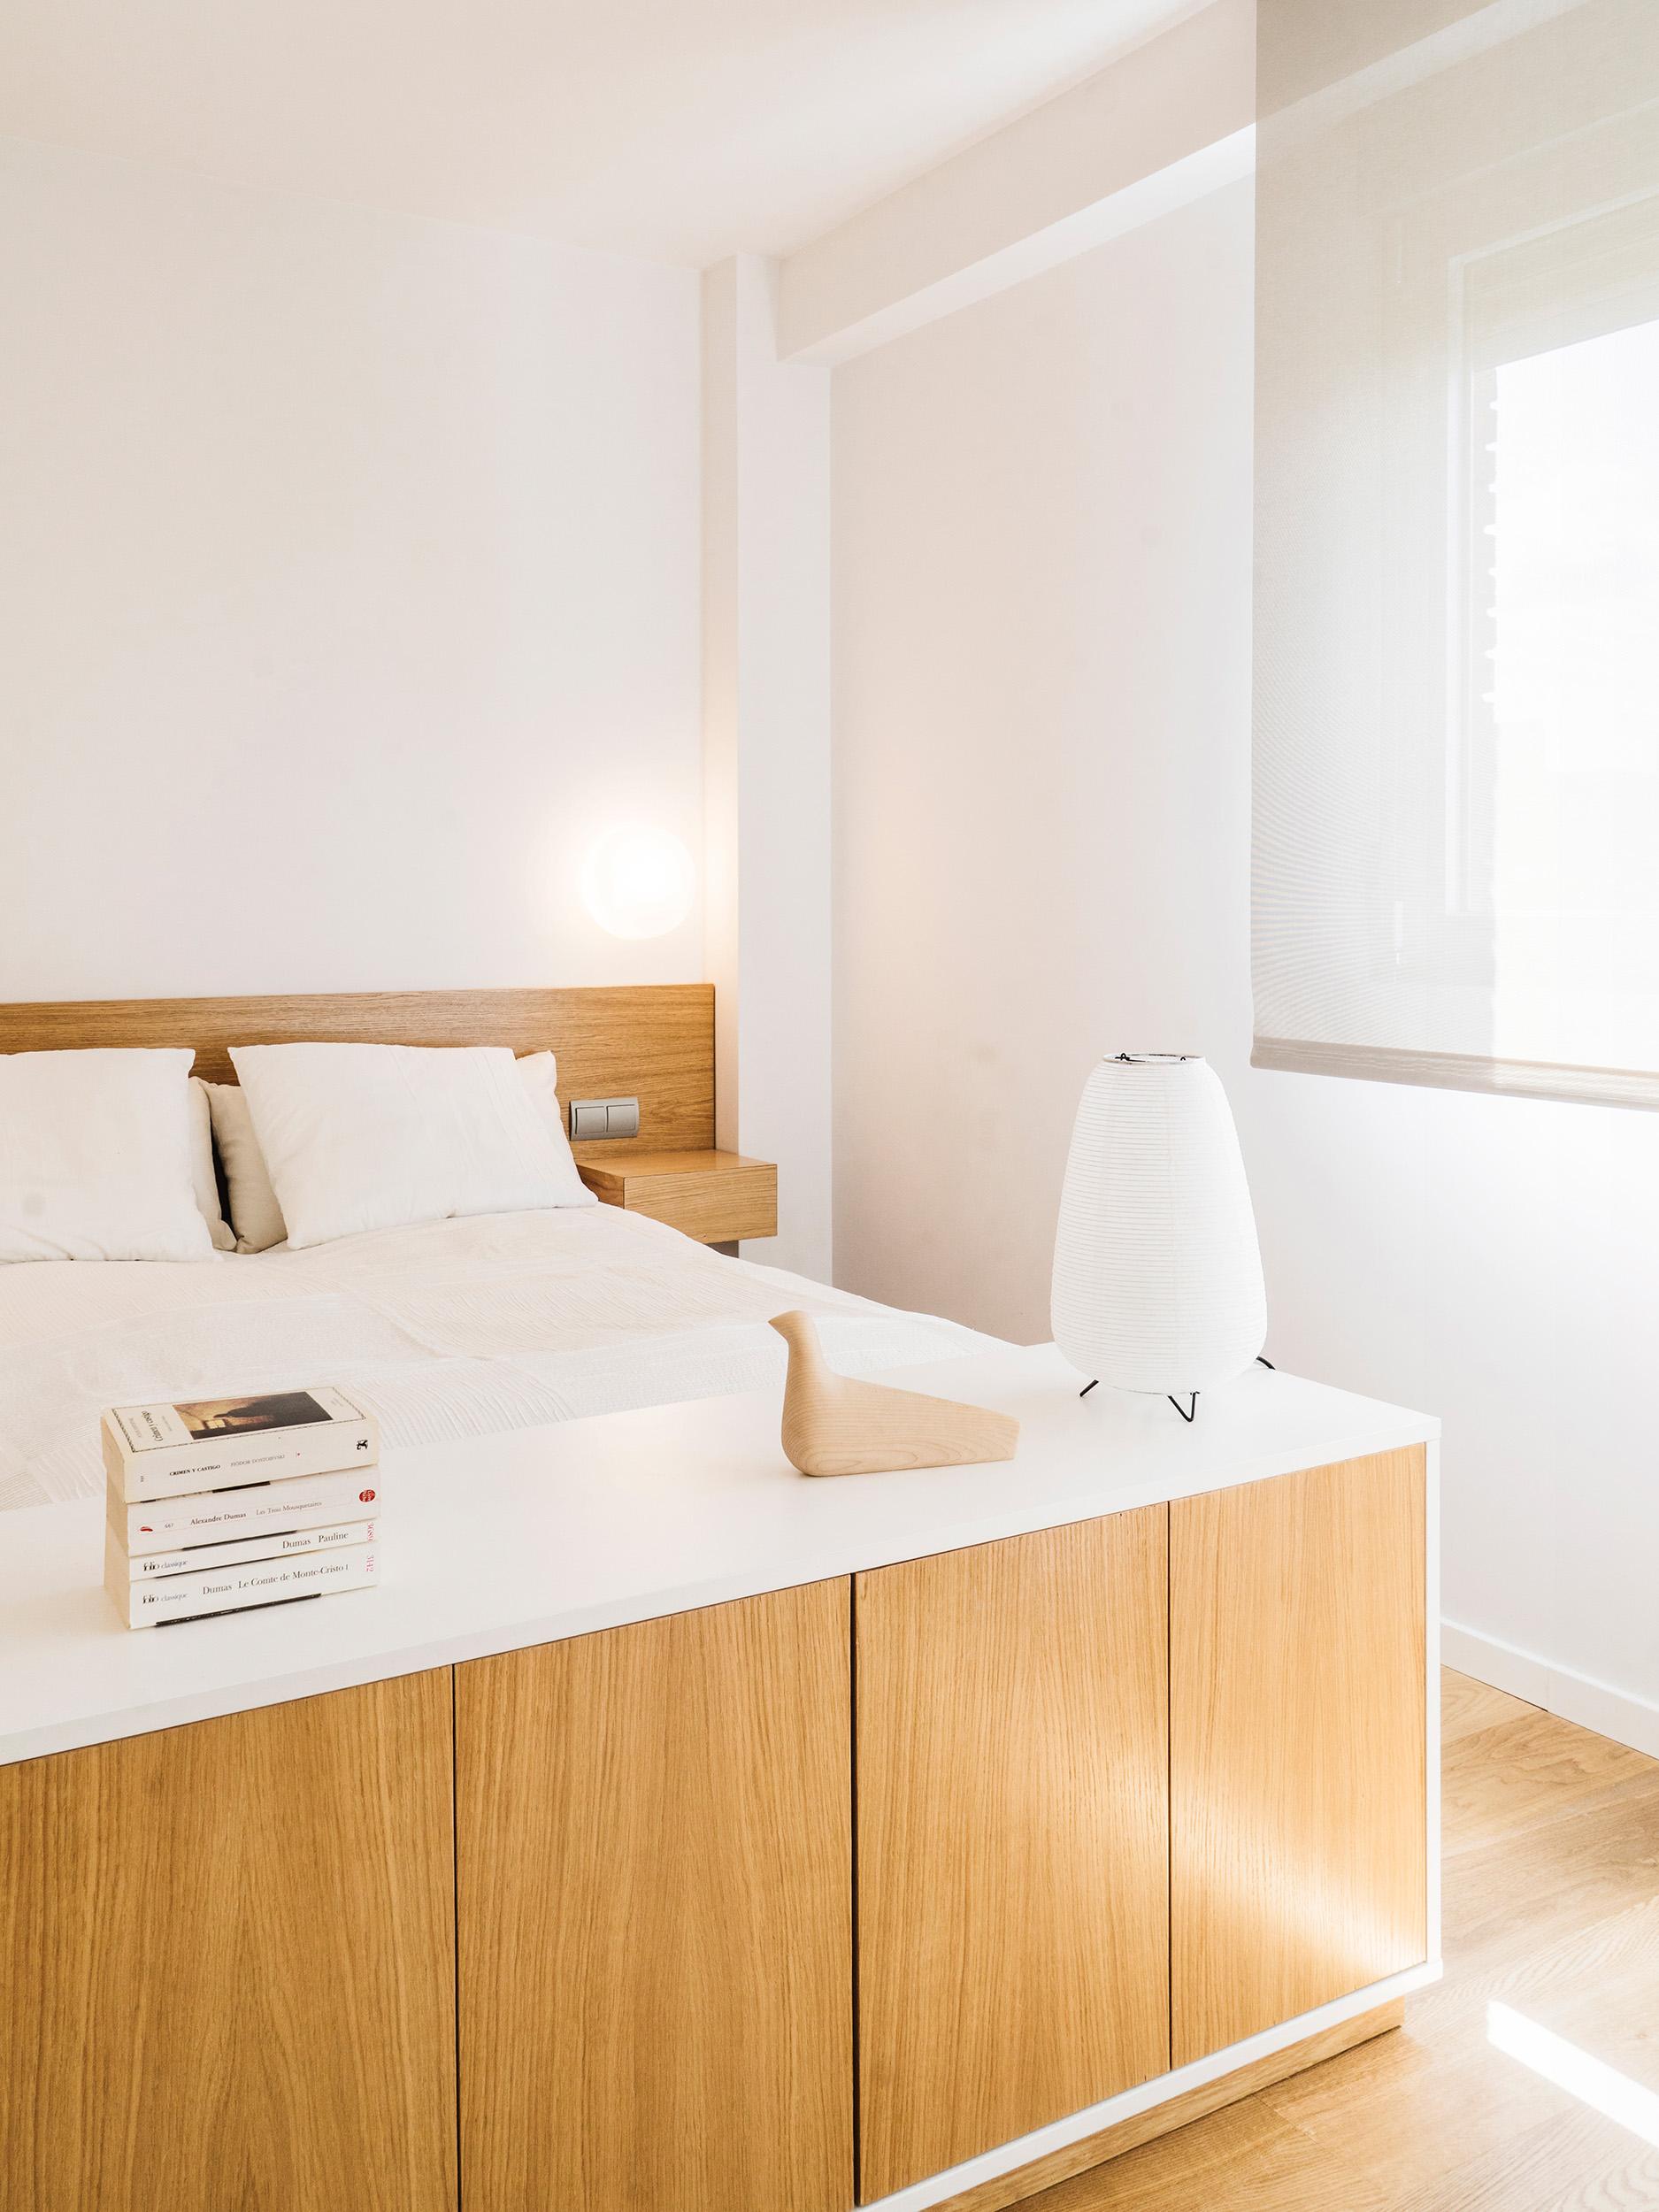 Apartamento PEAU 2014 - Madrid, España